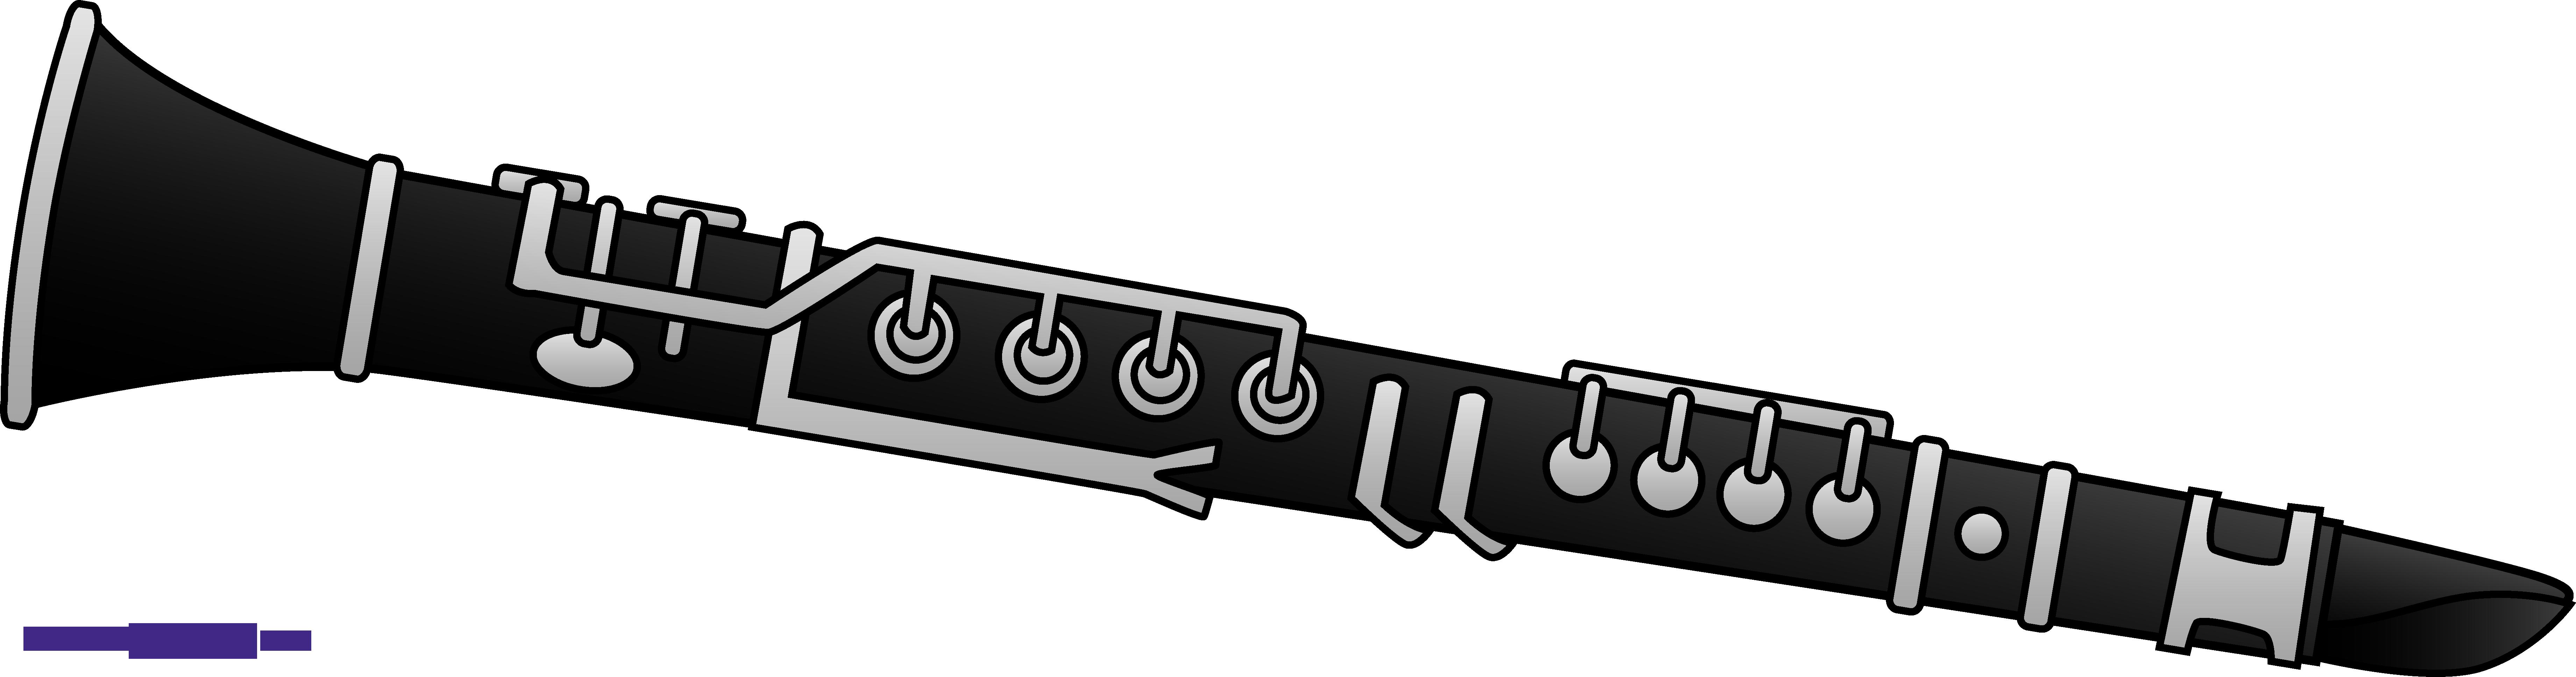 clarinet clipart clipart sweet clip art rh m sweetclipart com clarinet pictures clip art clarinet player clipart